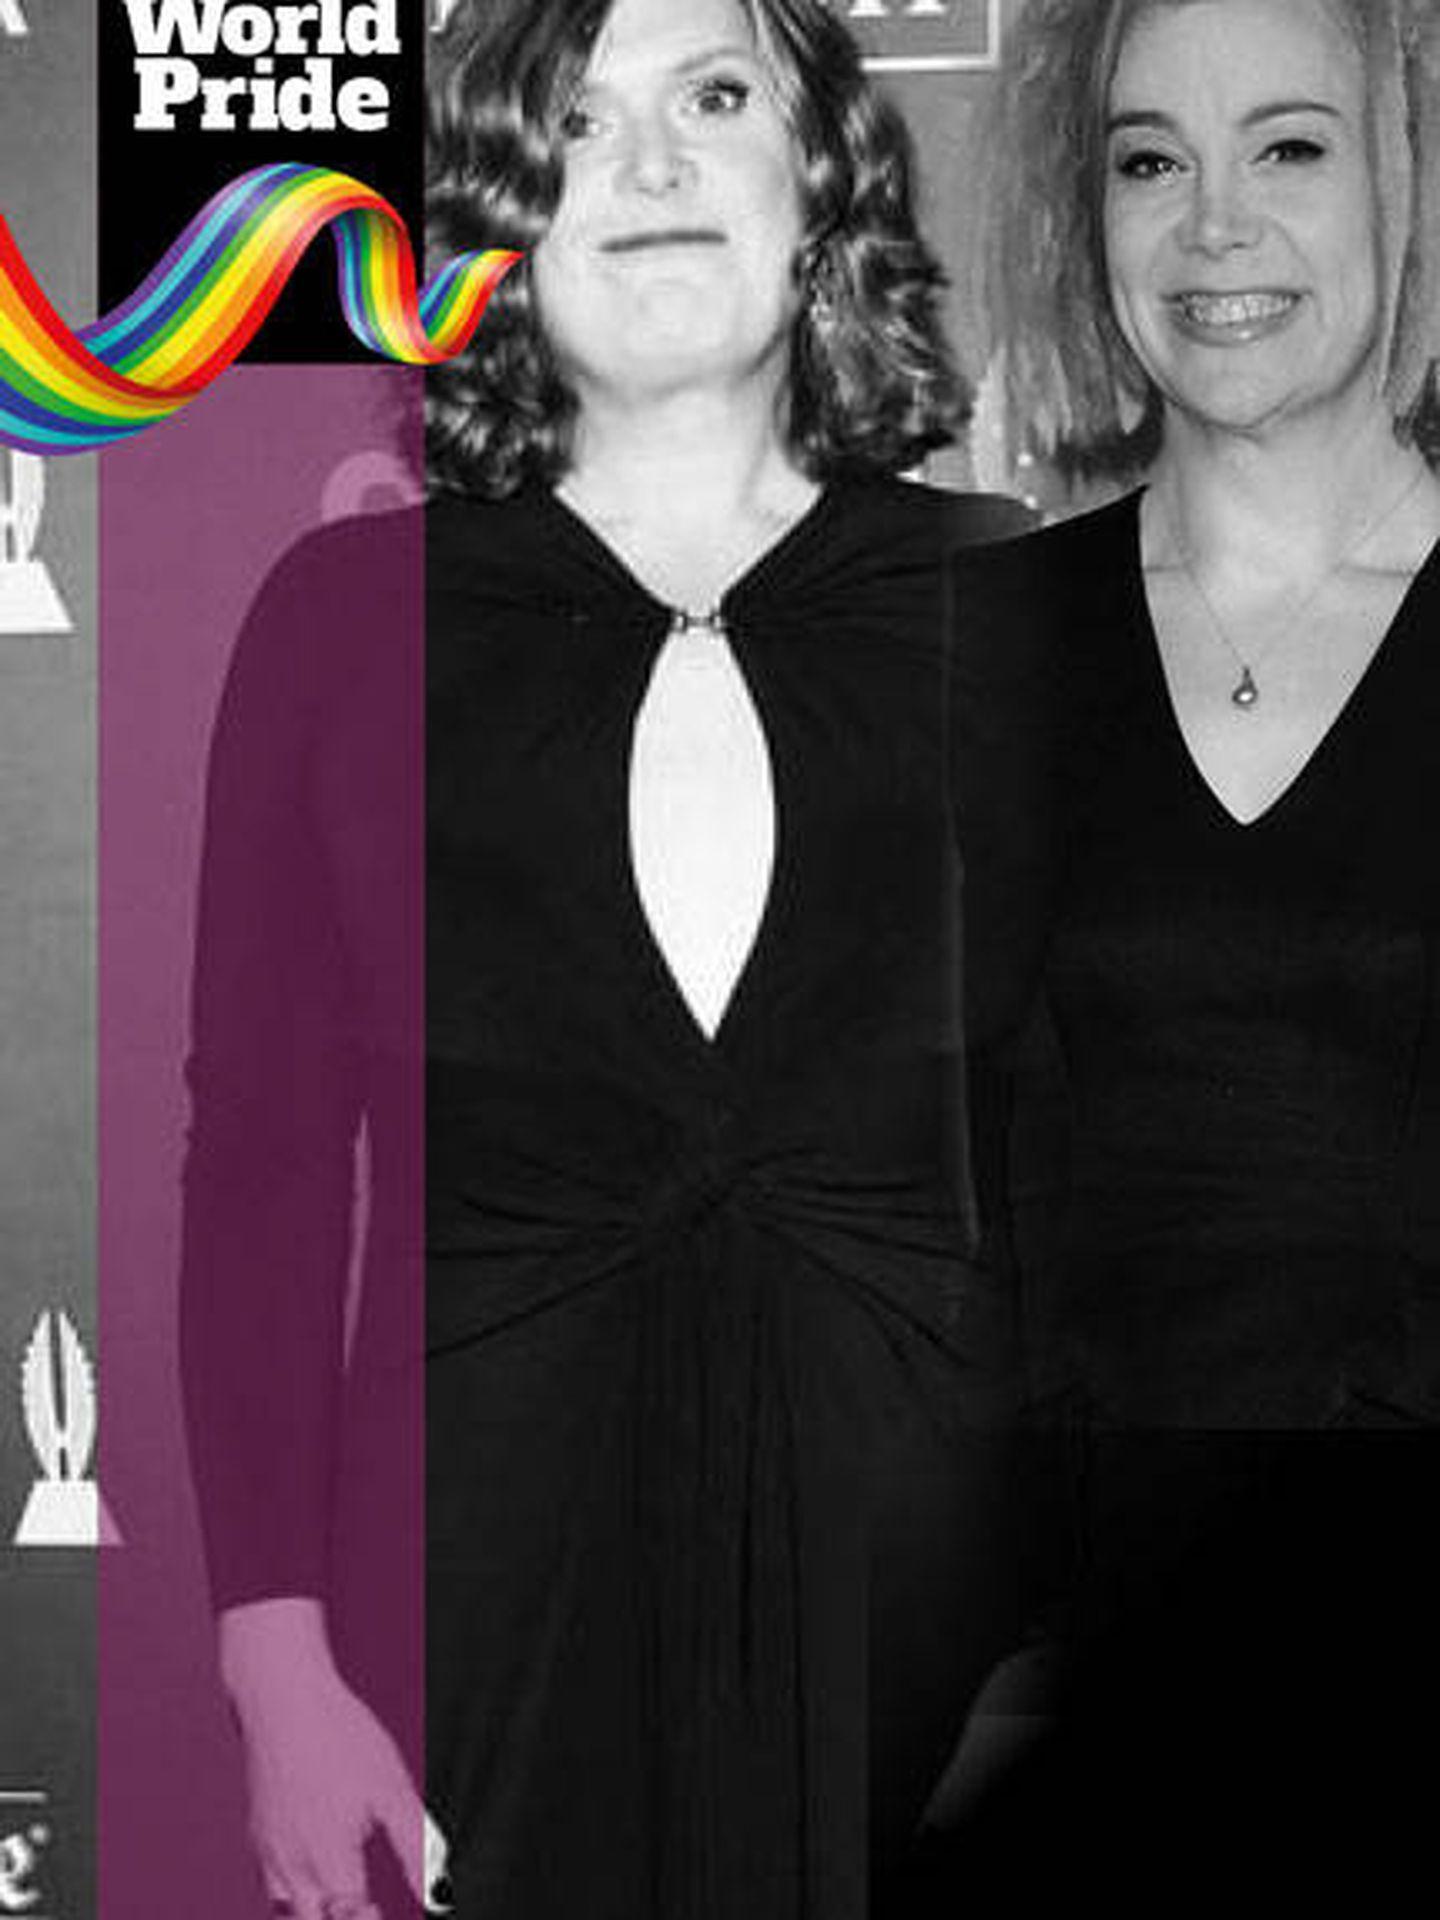 Orgullo LGTBI 2017: Lilly y Lana Wachowski.